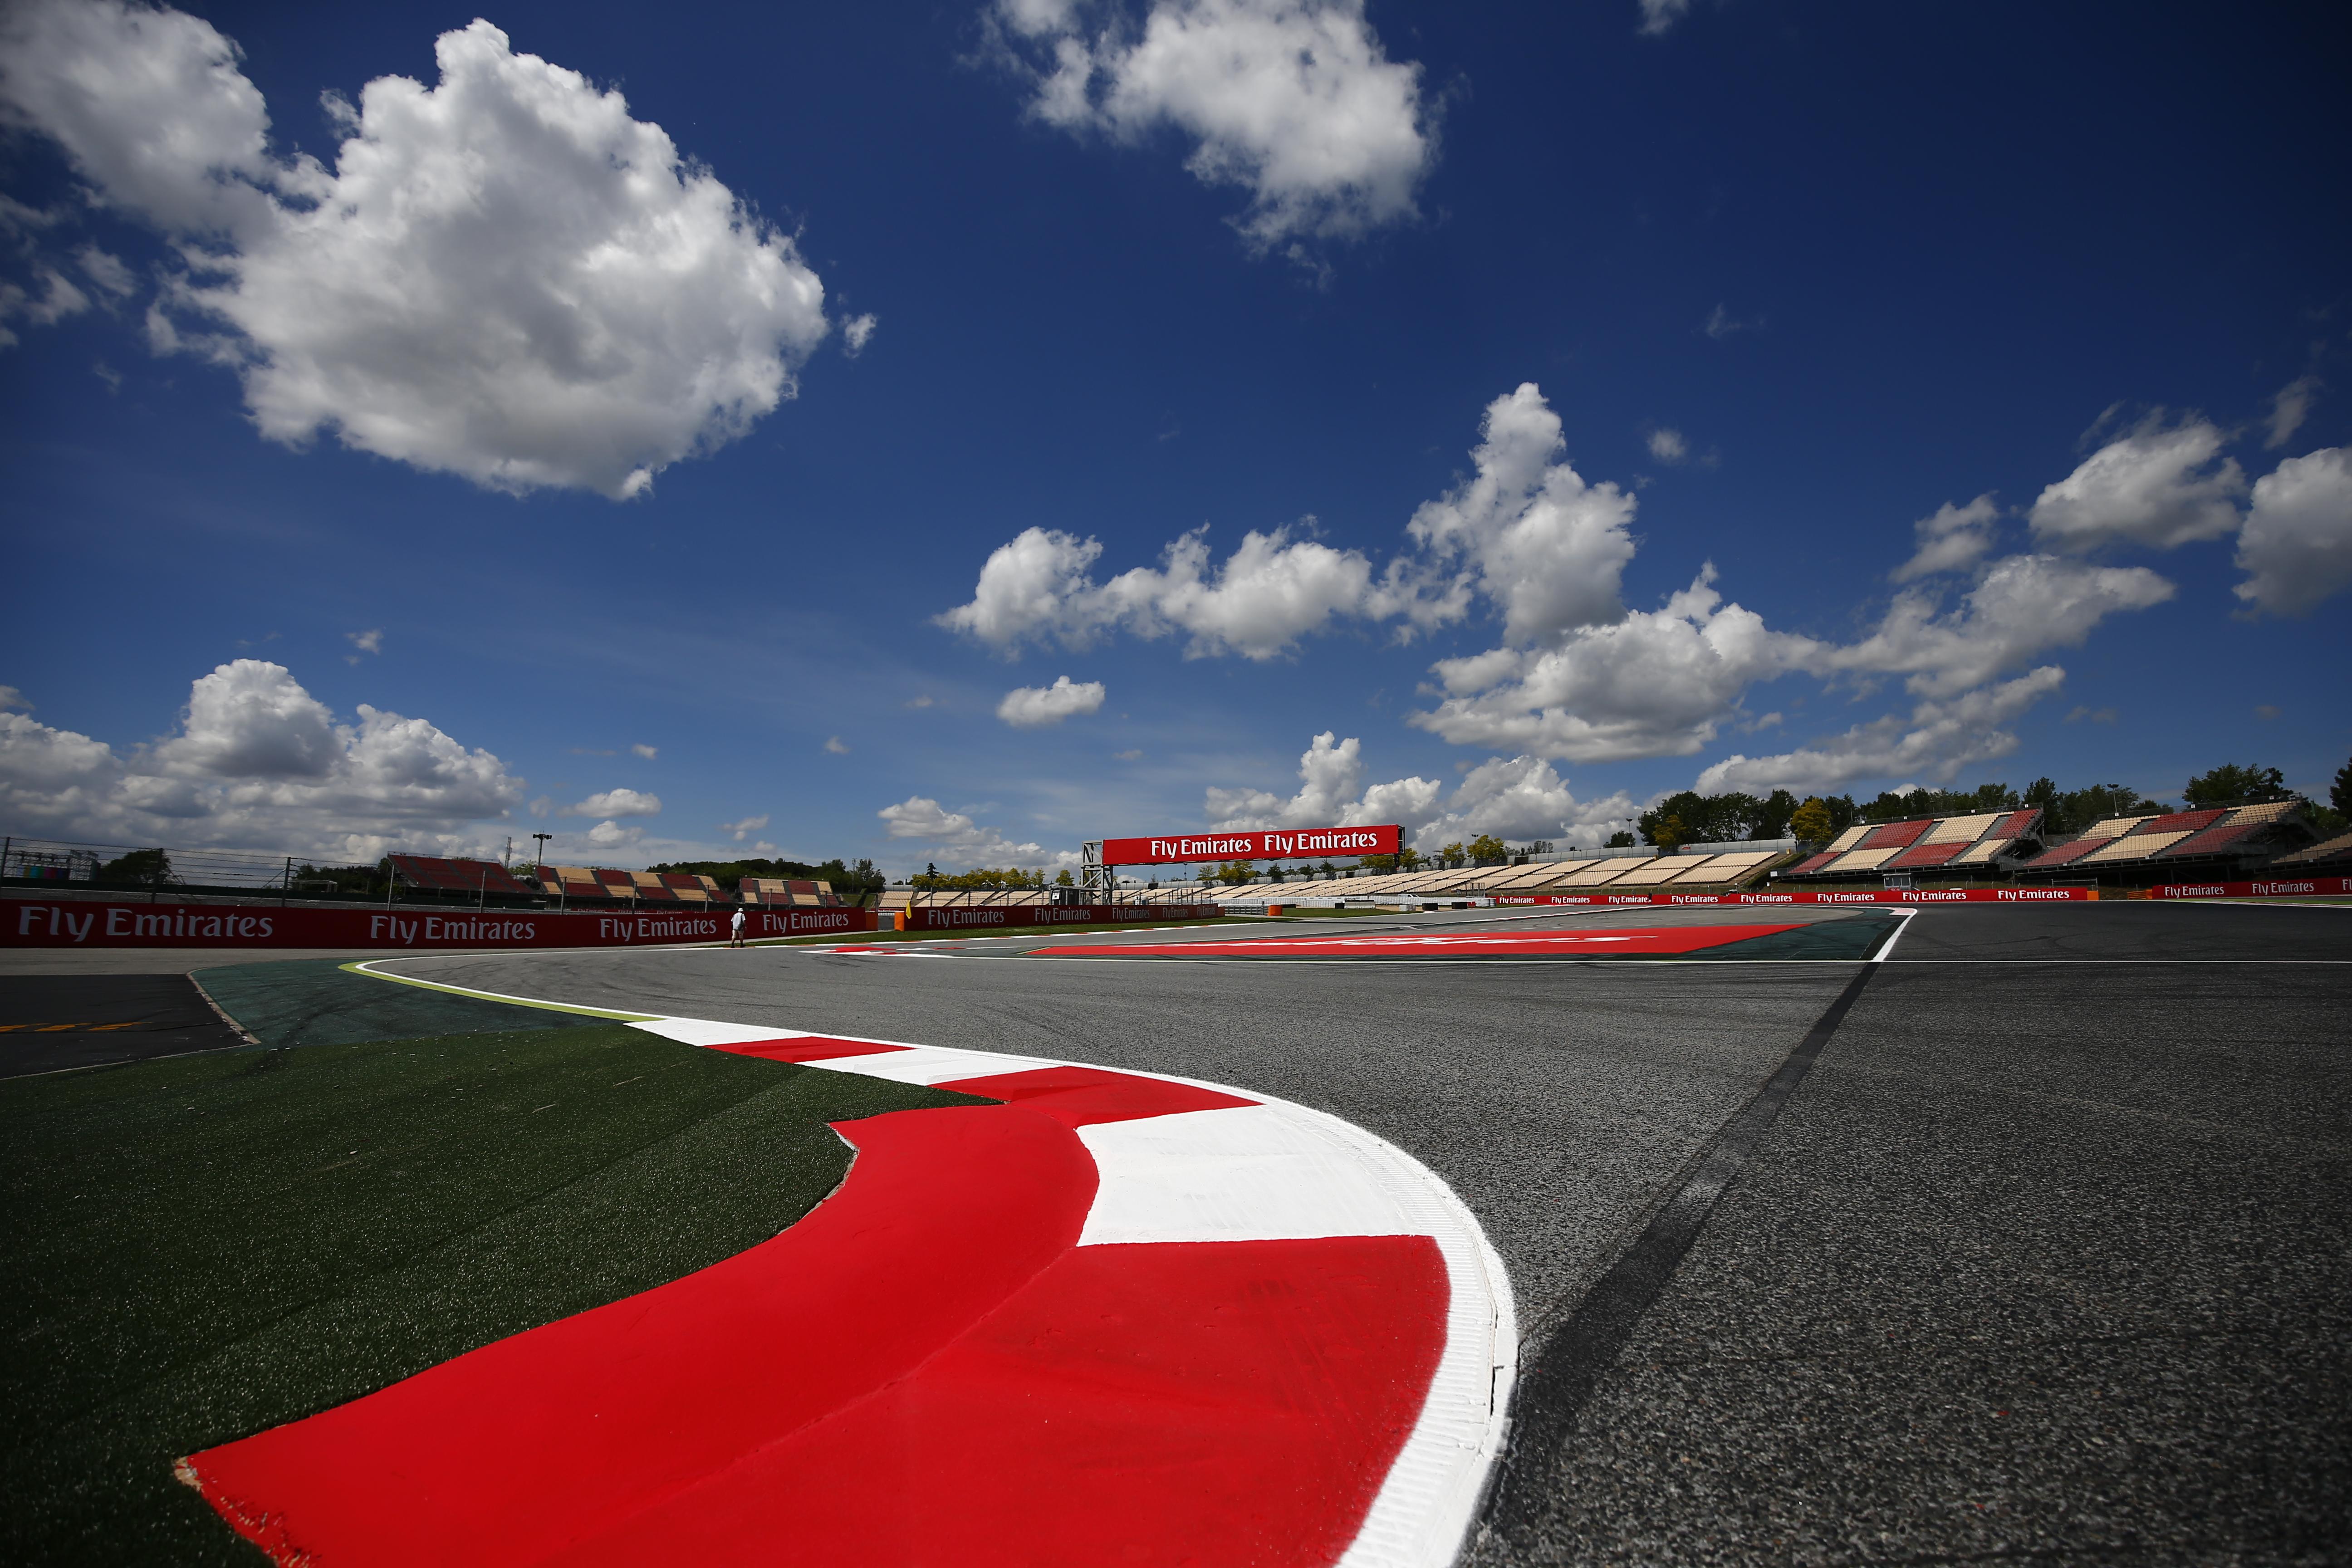 F1, Formula One, motorsport, Spanish Grand Prix